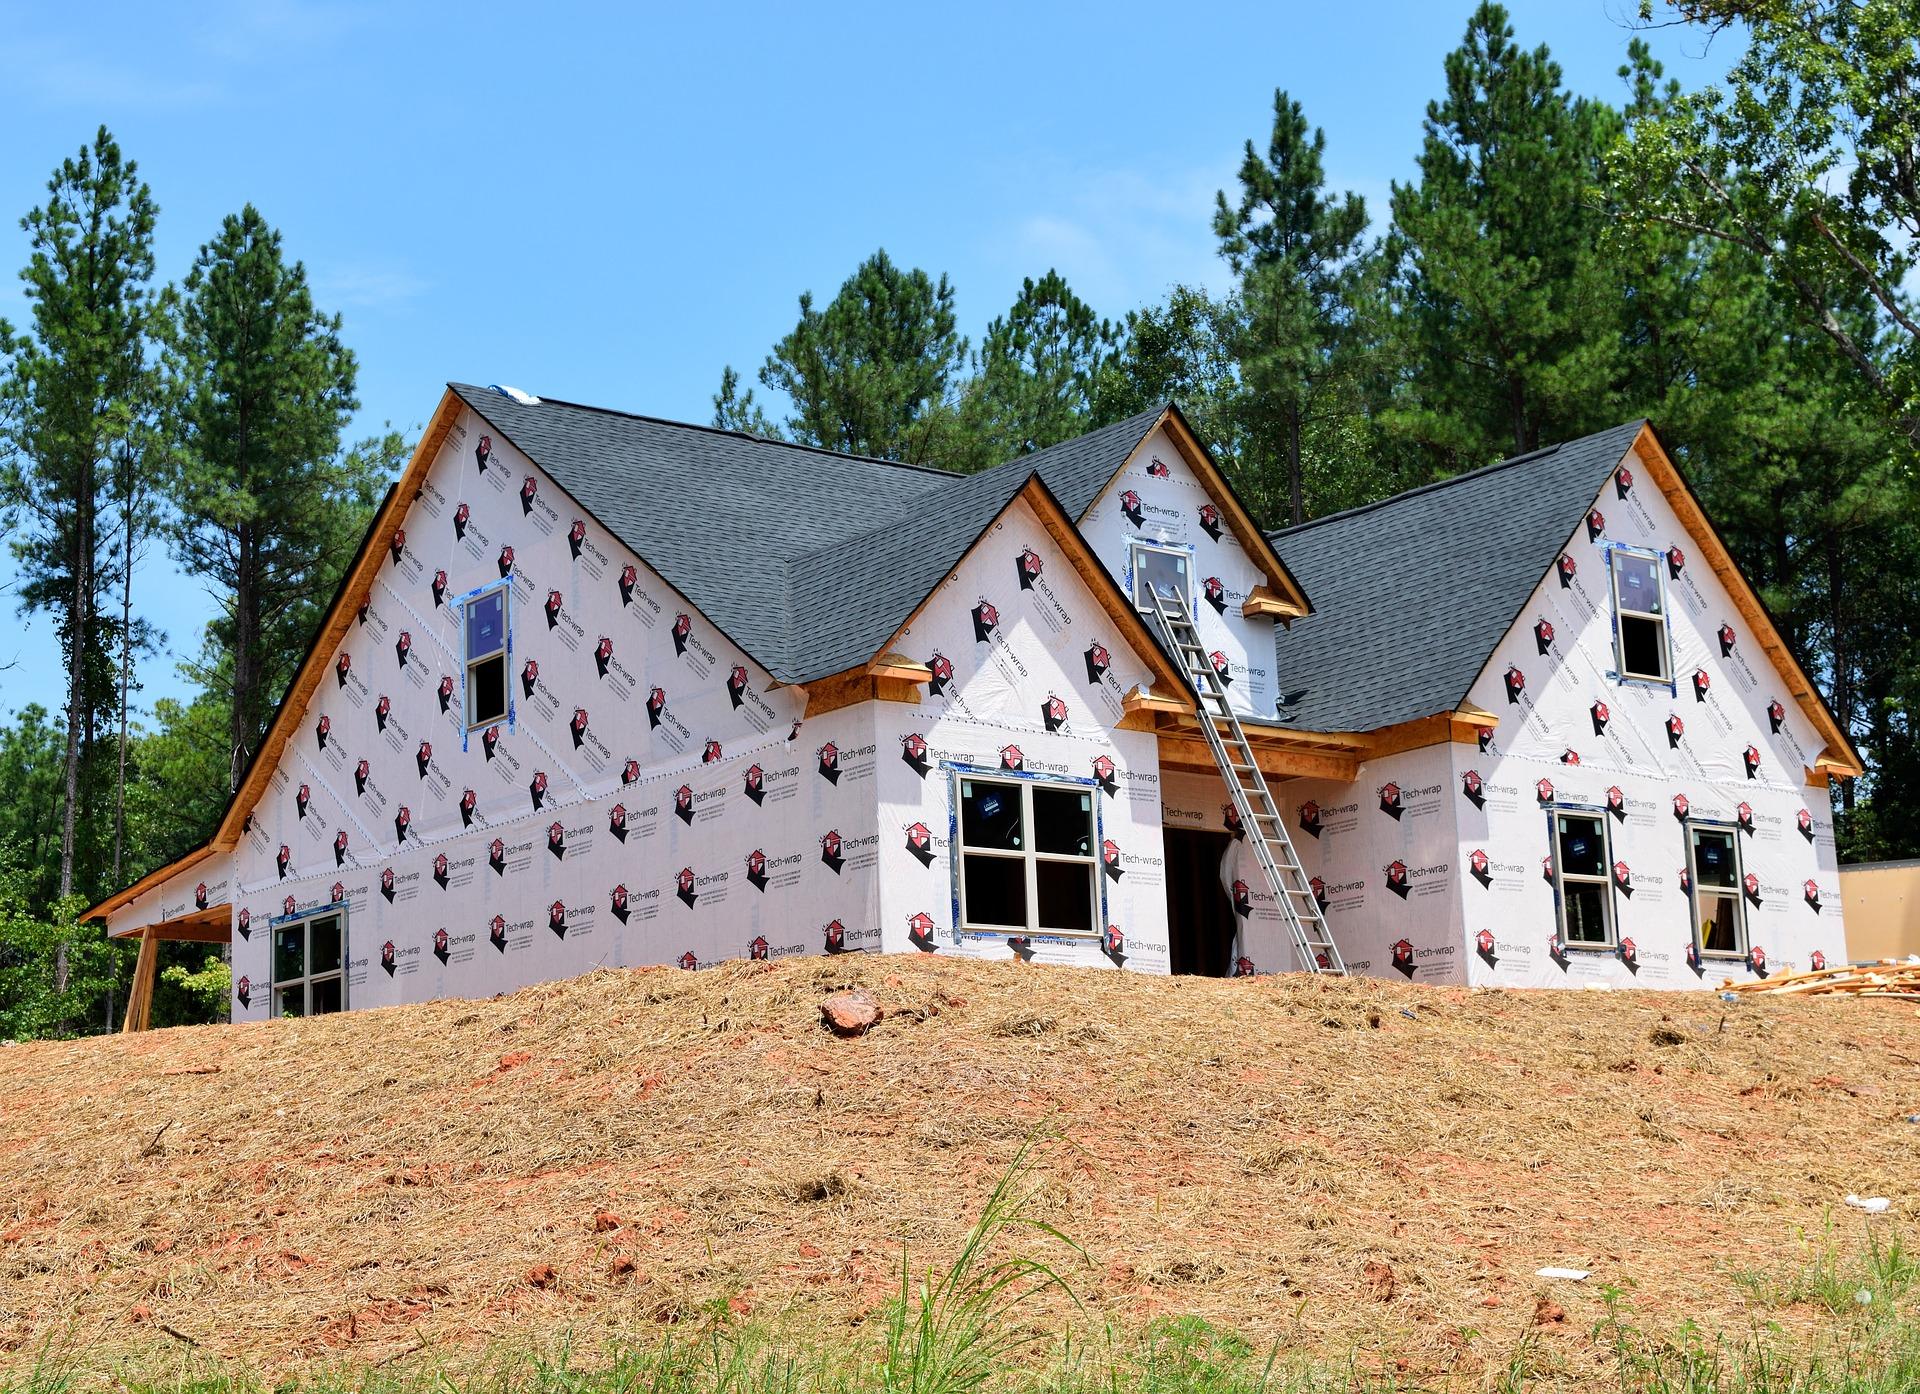 home-construction-2538831_1920.jpg